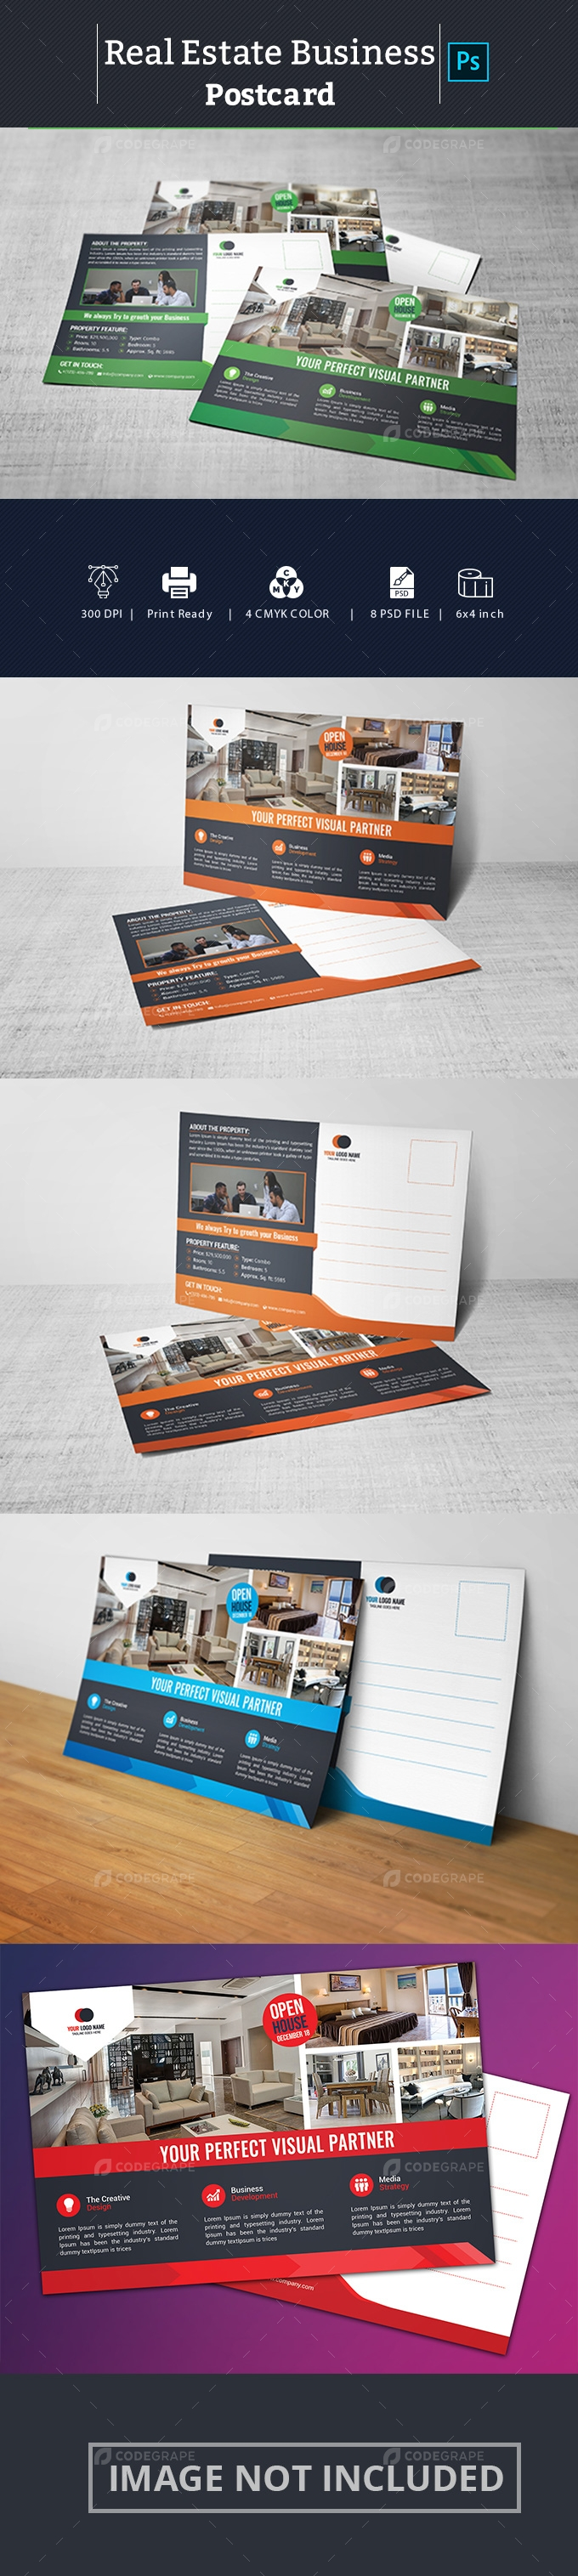 Real Estate Business Postcard